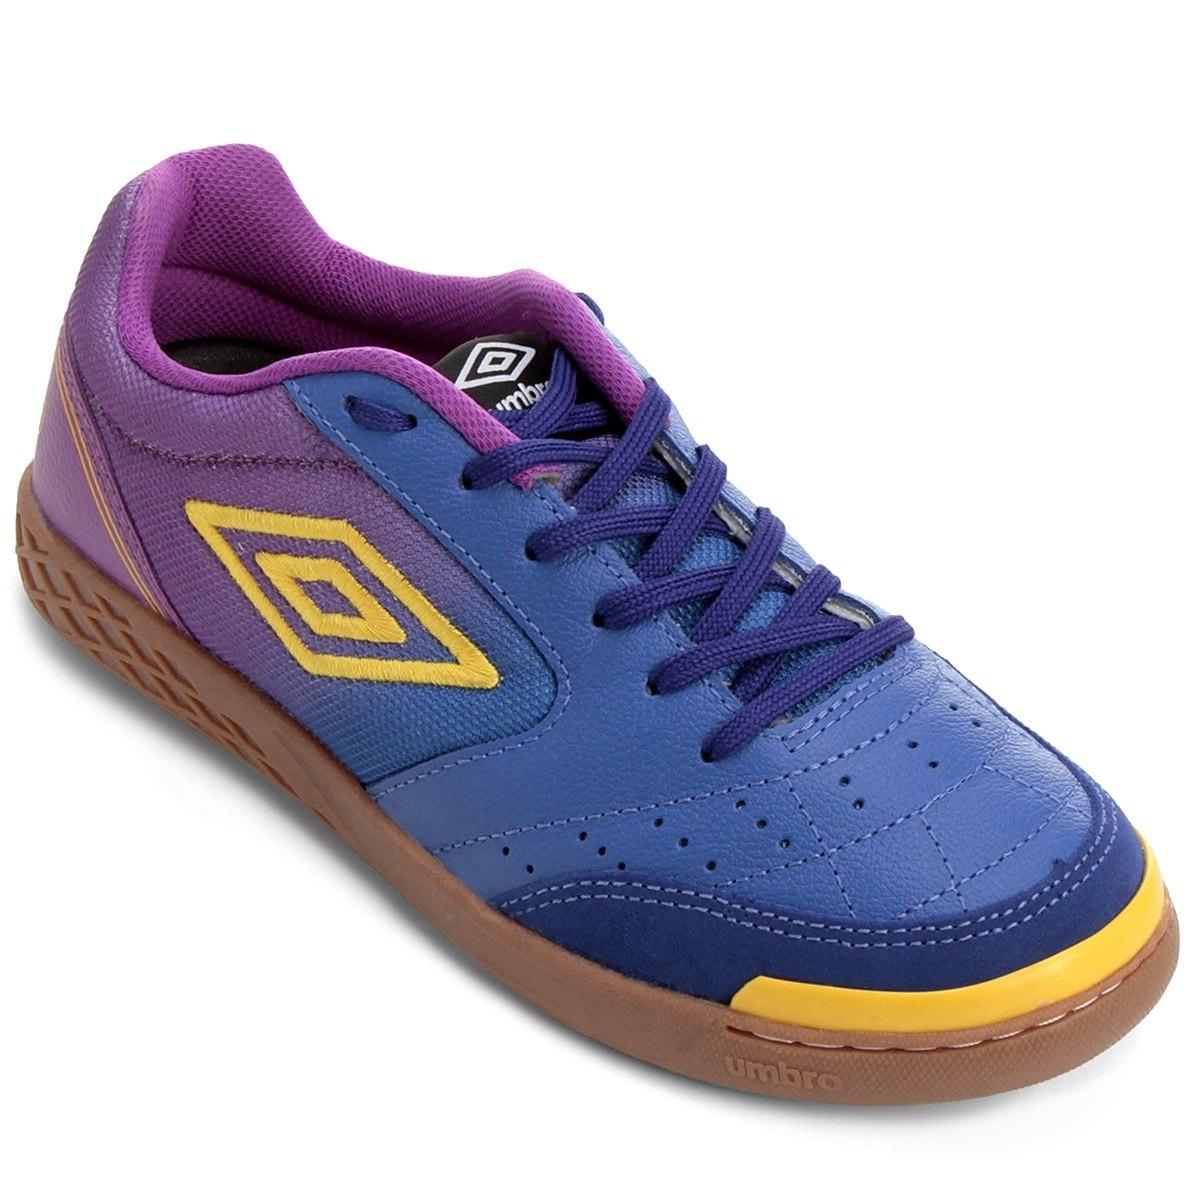 ec650cf0bbee0 Chuteira Futsal Umbro Box - R$ 180,00 em Mercado Livre